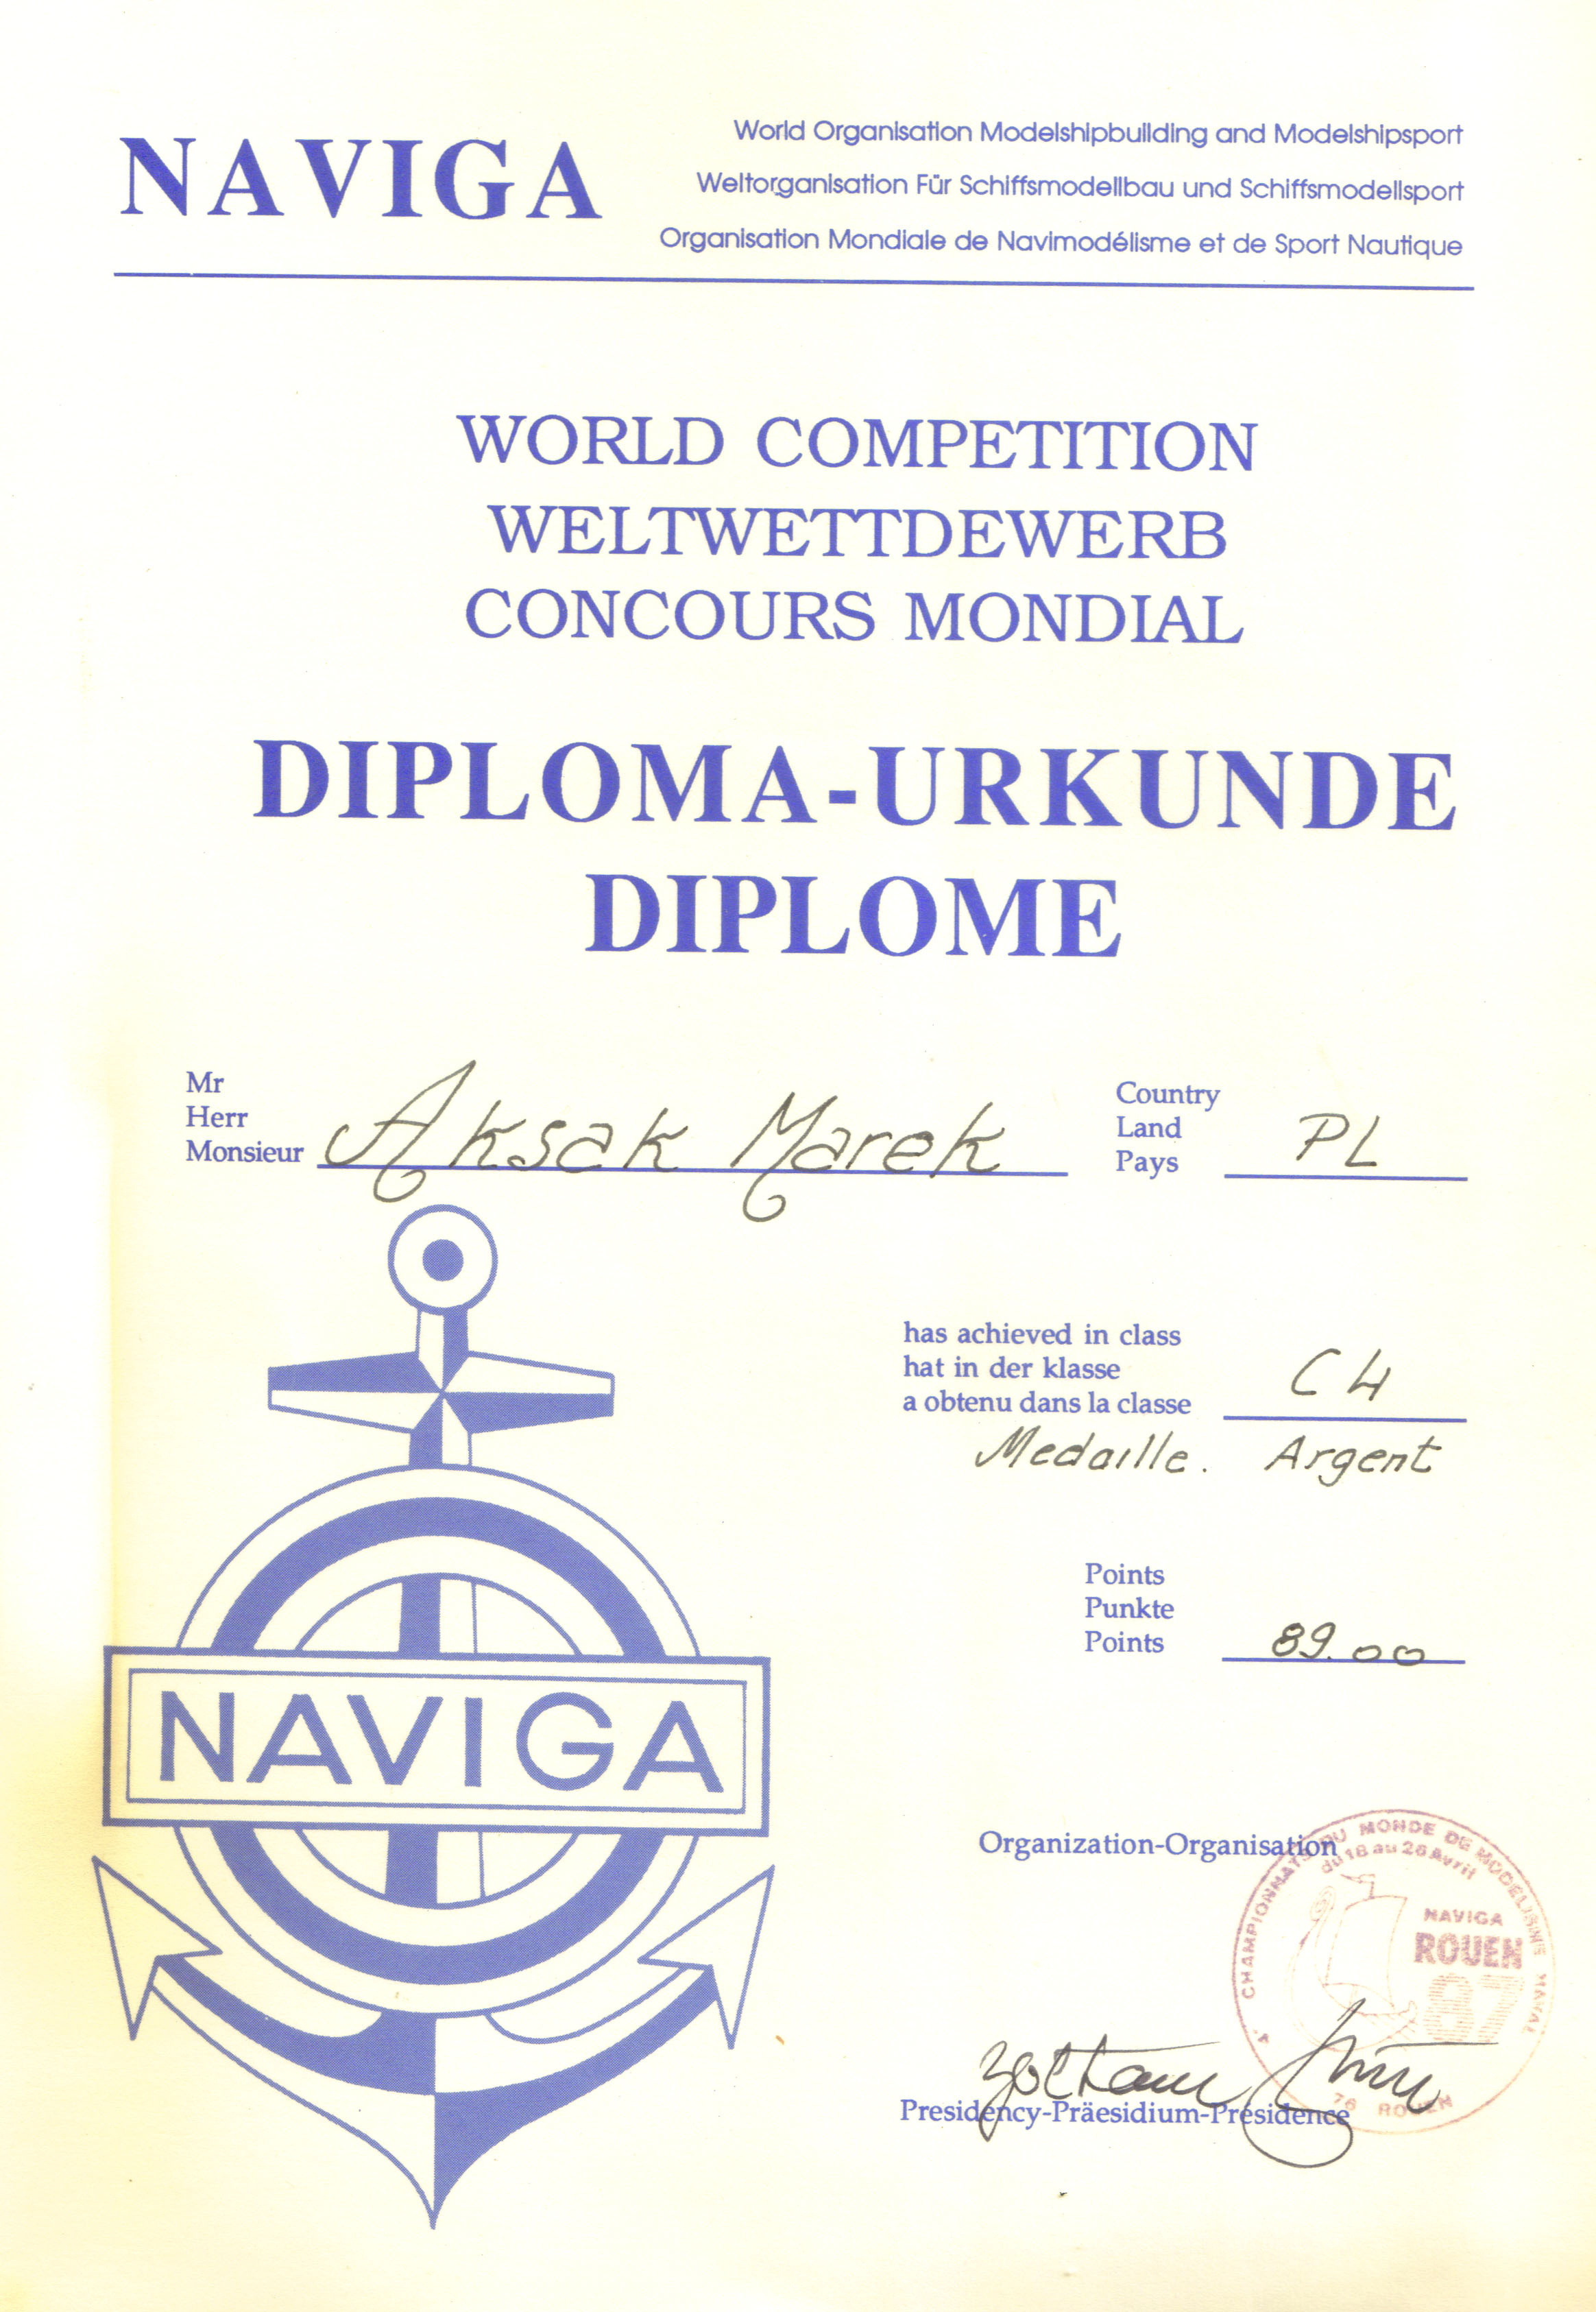 Dyplom 18 Rouen 1987 Srebro